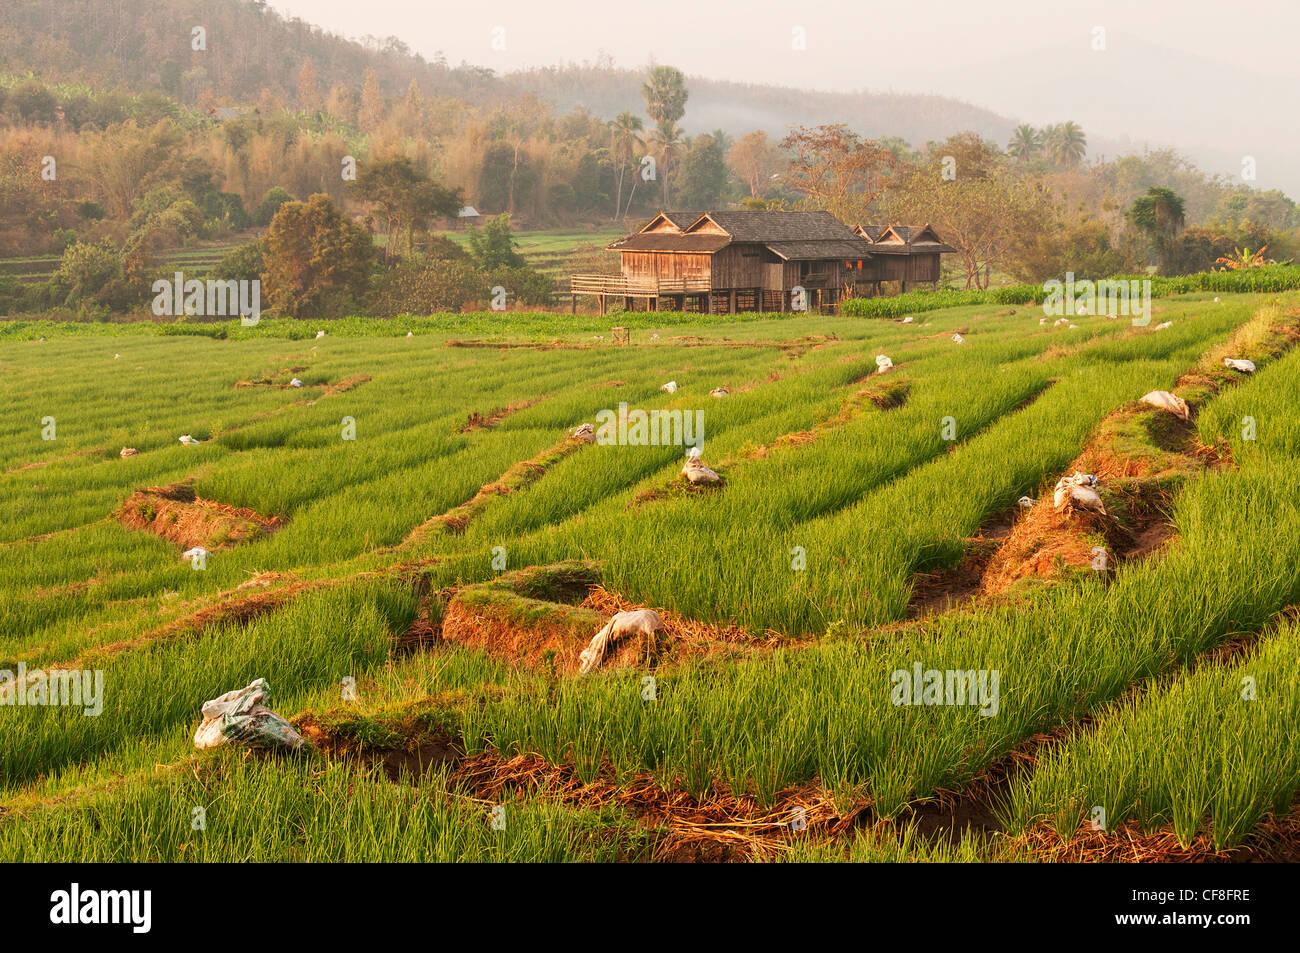 Elk208-2378 Thailand, Mae Chaem, rice fields - Stock Image